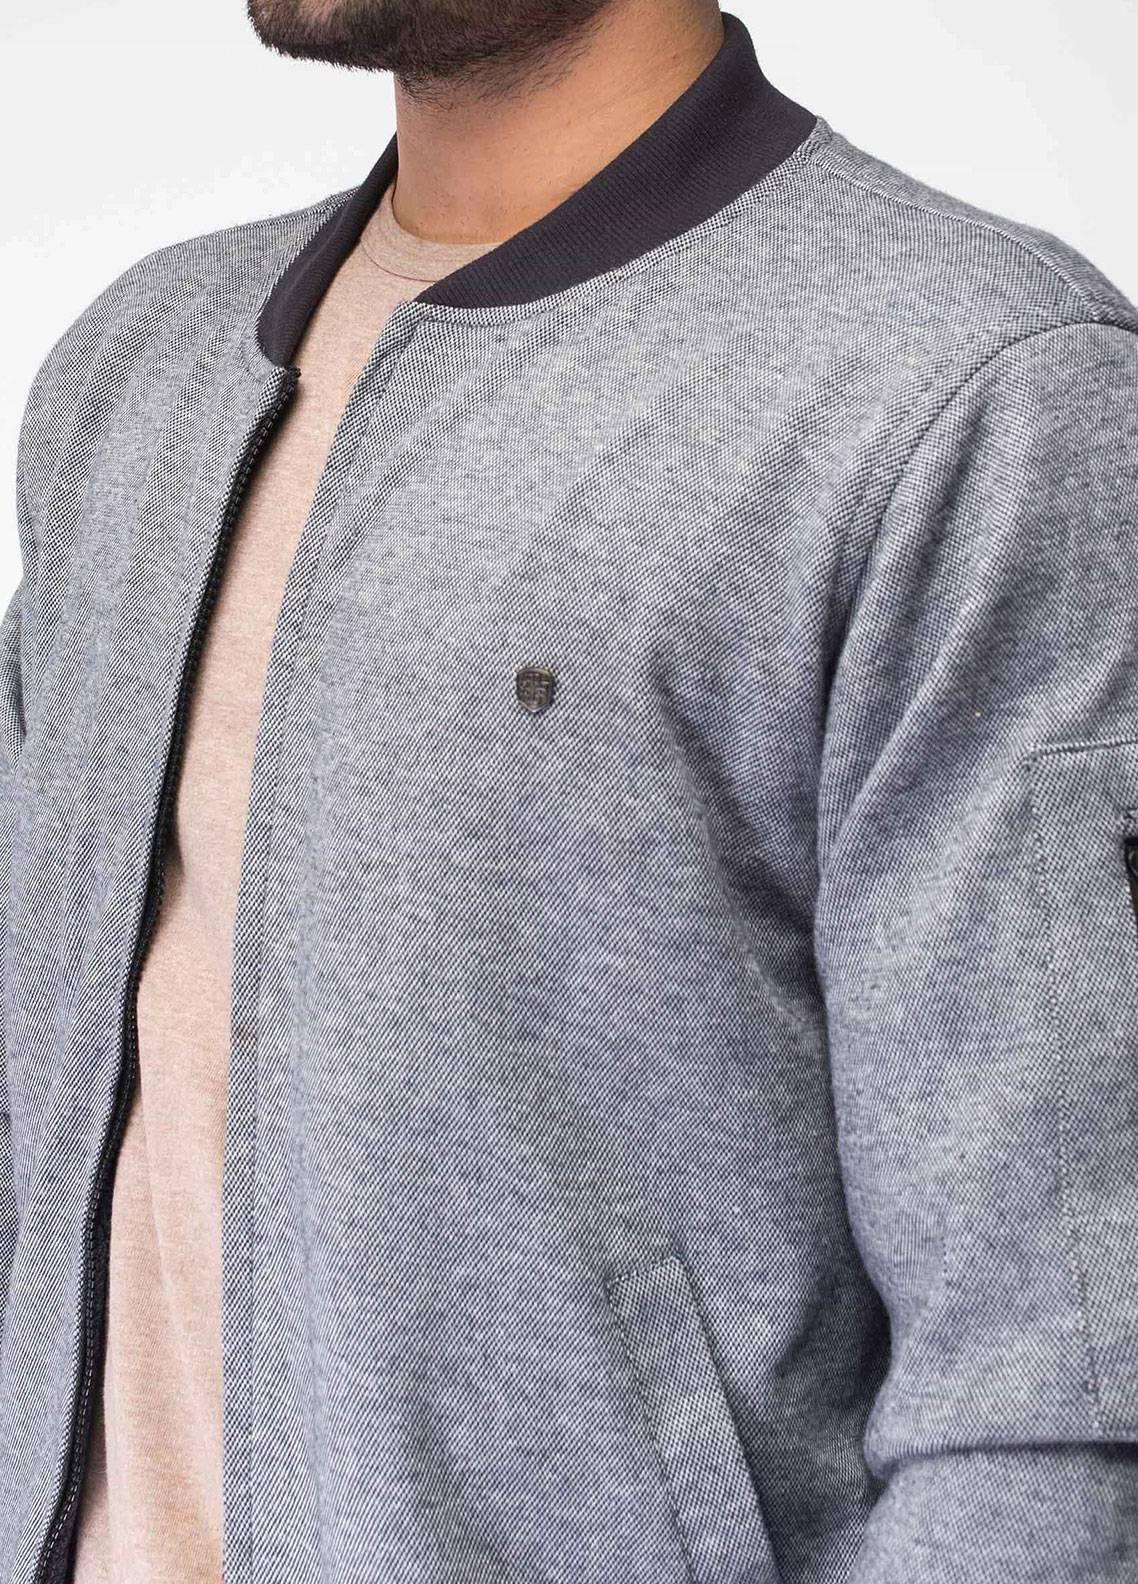 Brumano Polyester Full Sleeves Men Jackets - Blue BRM-11-0083